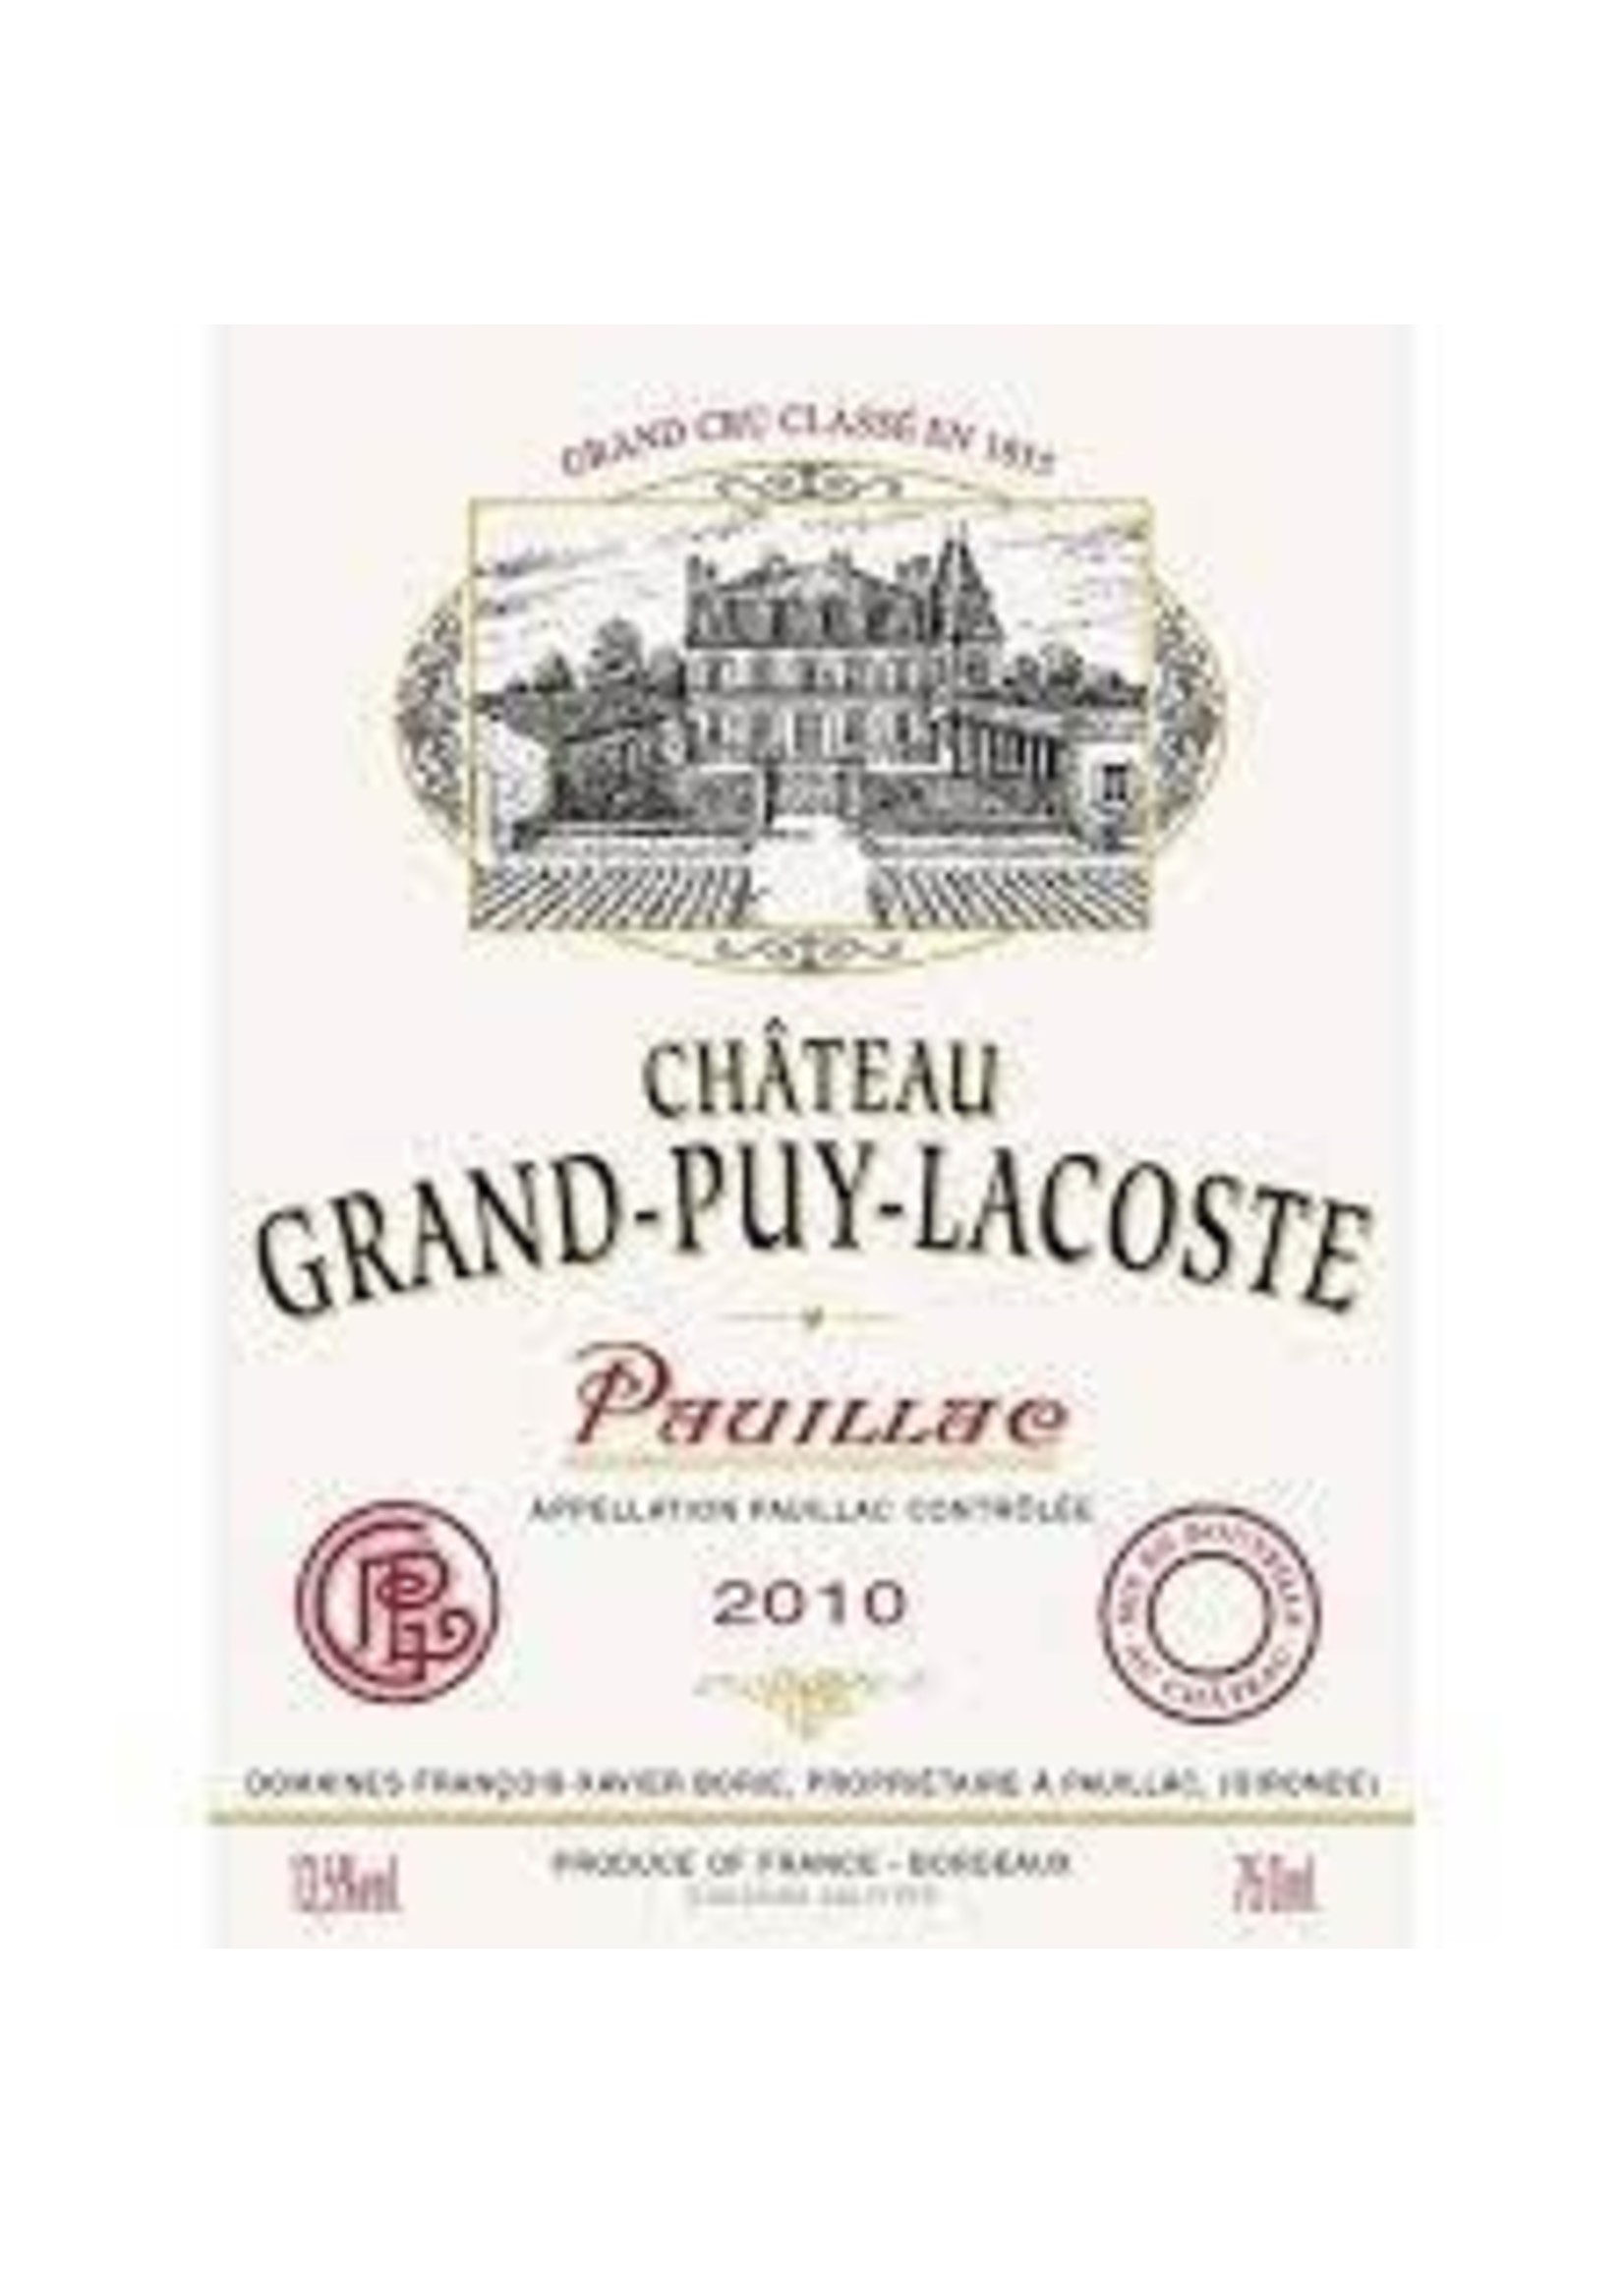 Chateau Grand-Puy-Lacoste 2010 Pauillac 12bt OWC [PRE-ARRIVAL]